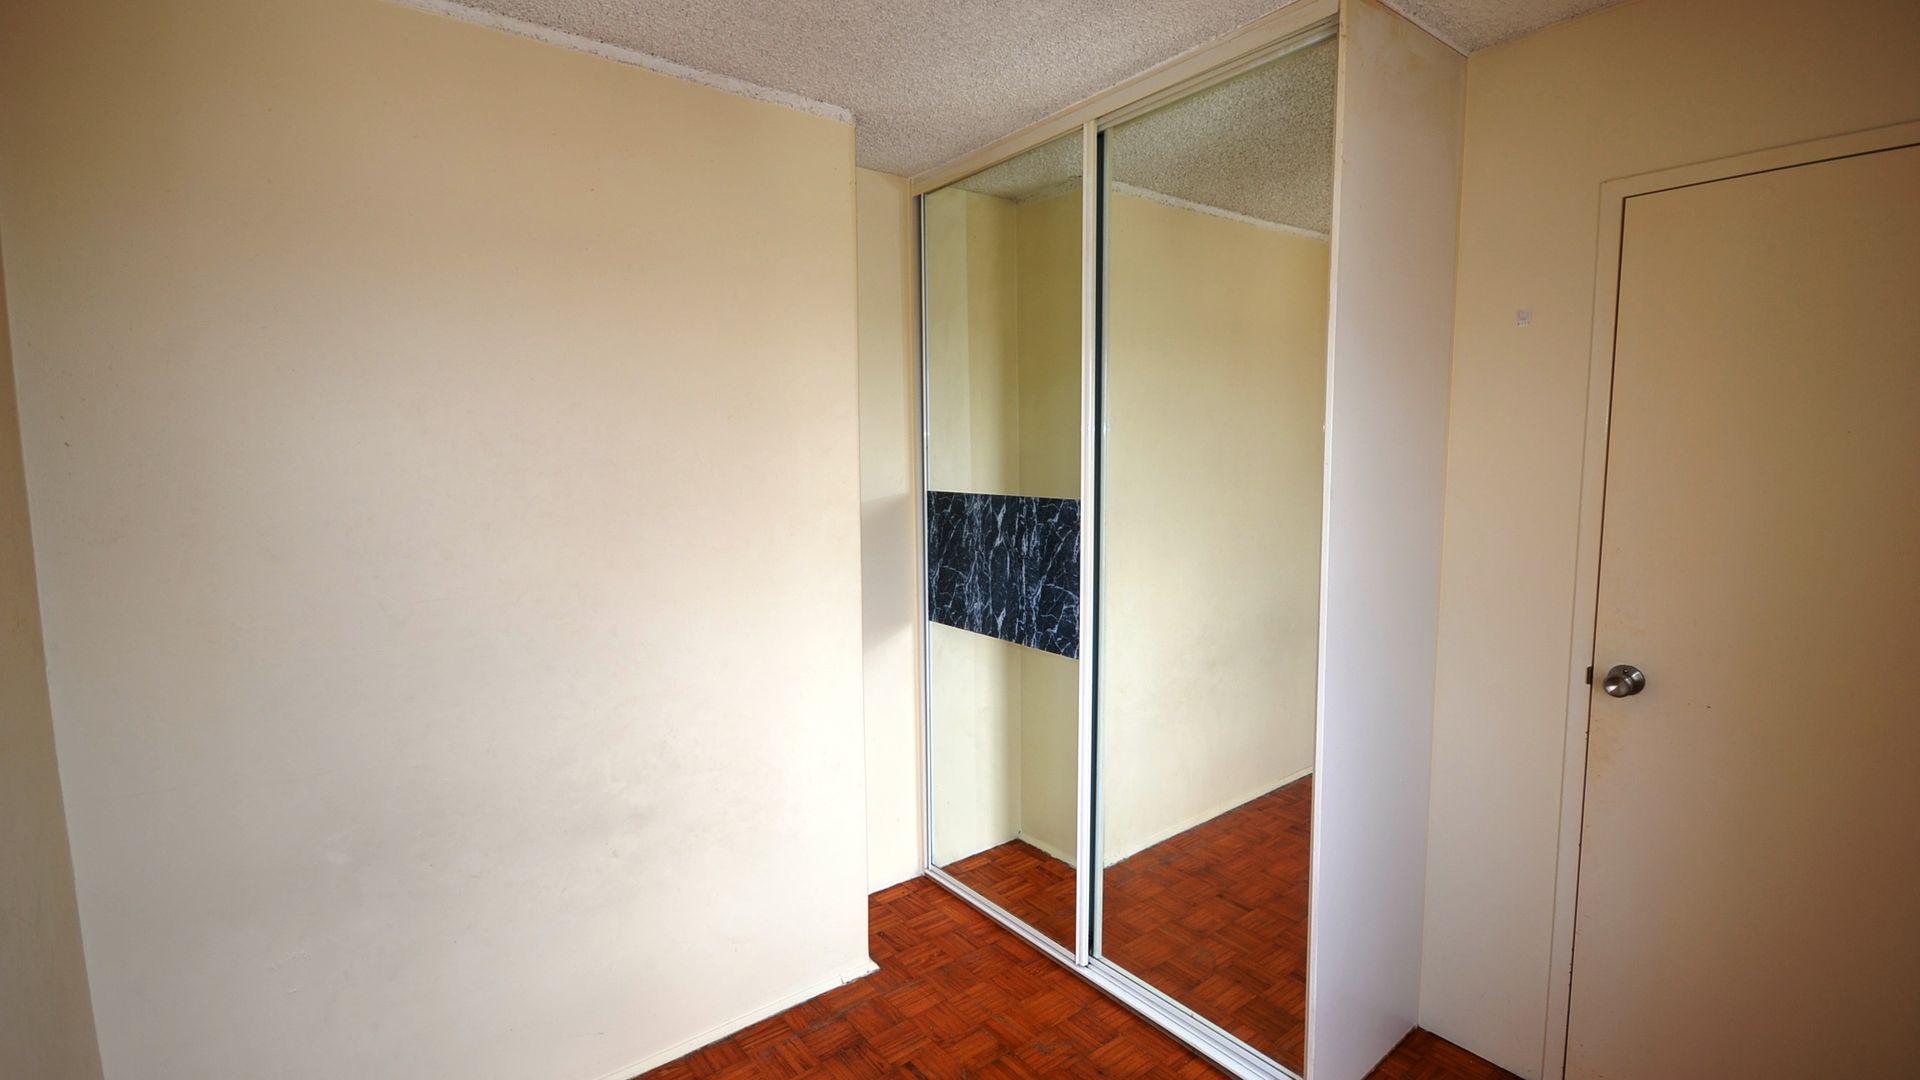 42/11-13 Cooma Street, Preston VIC 3072, Image 2